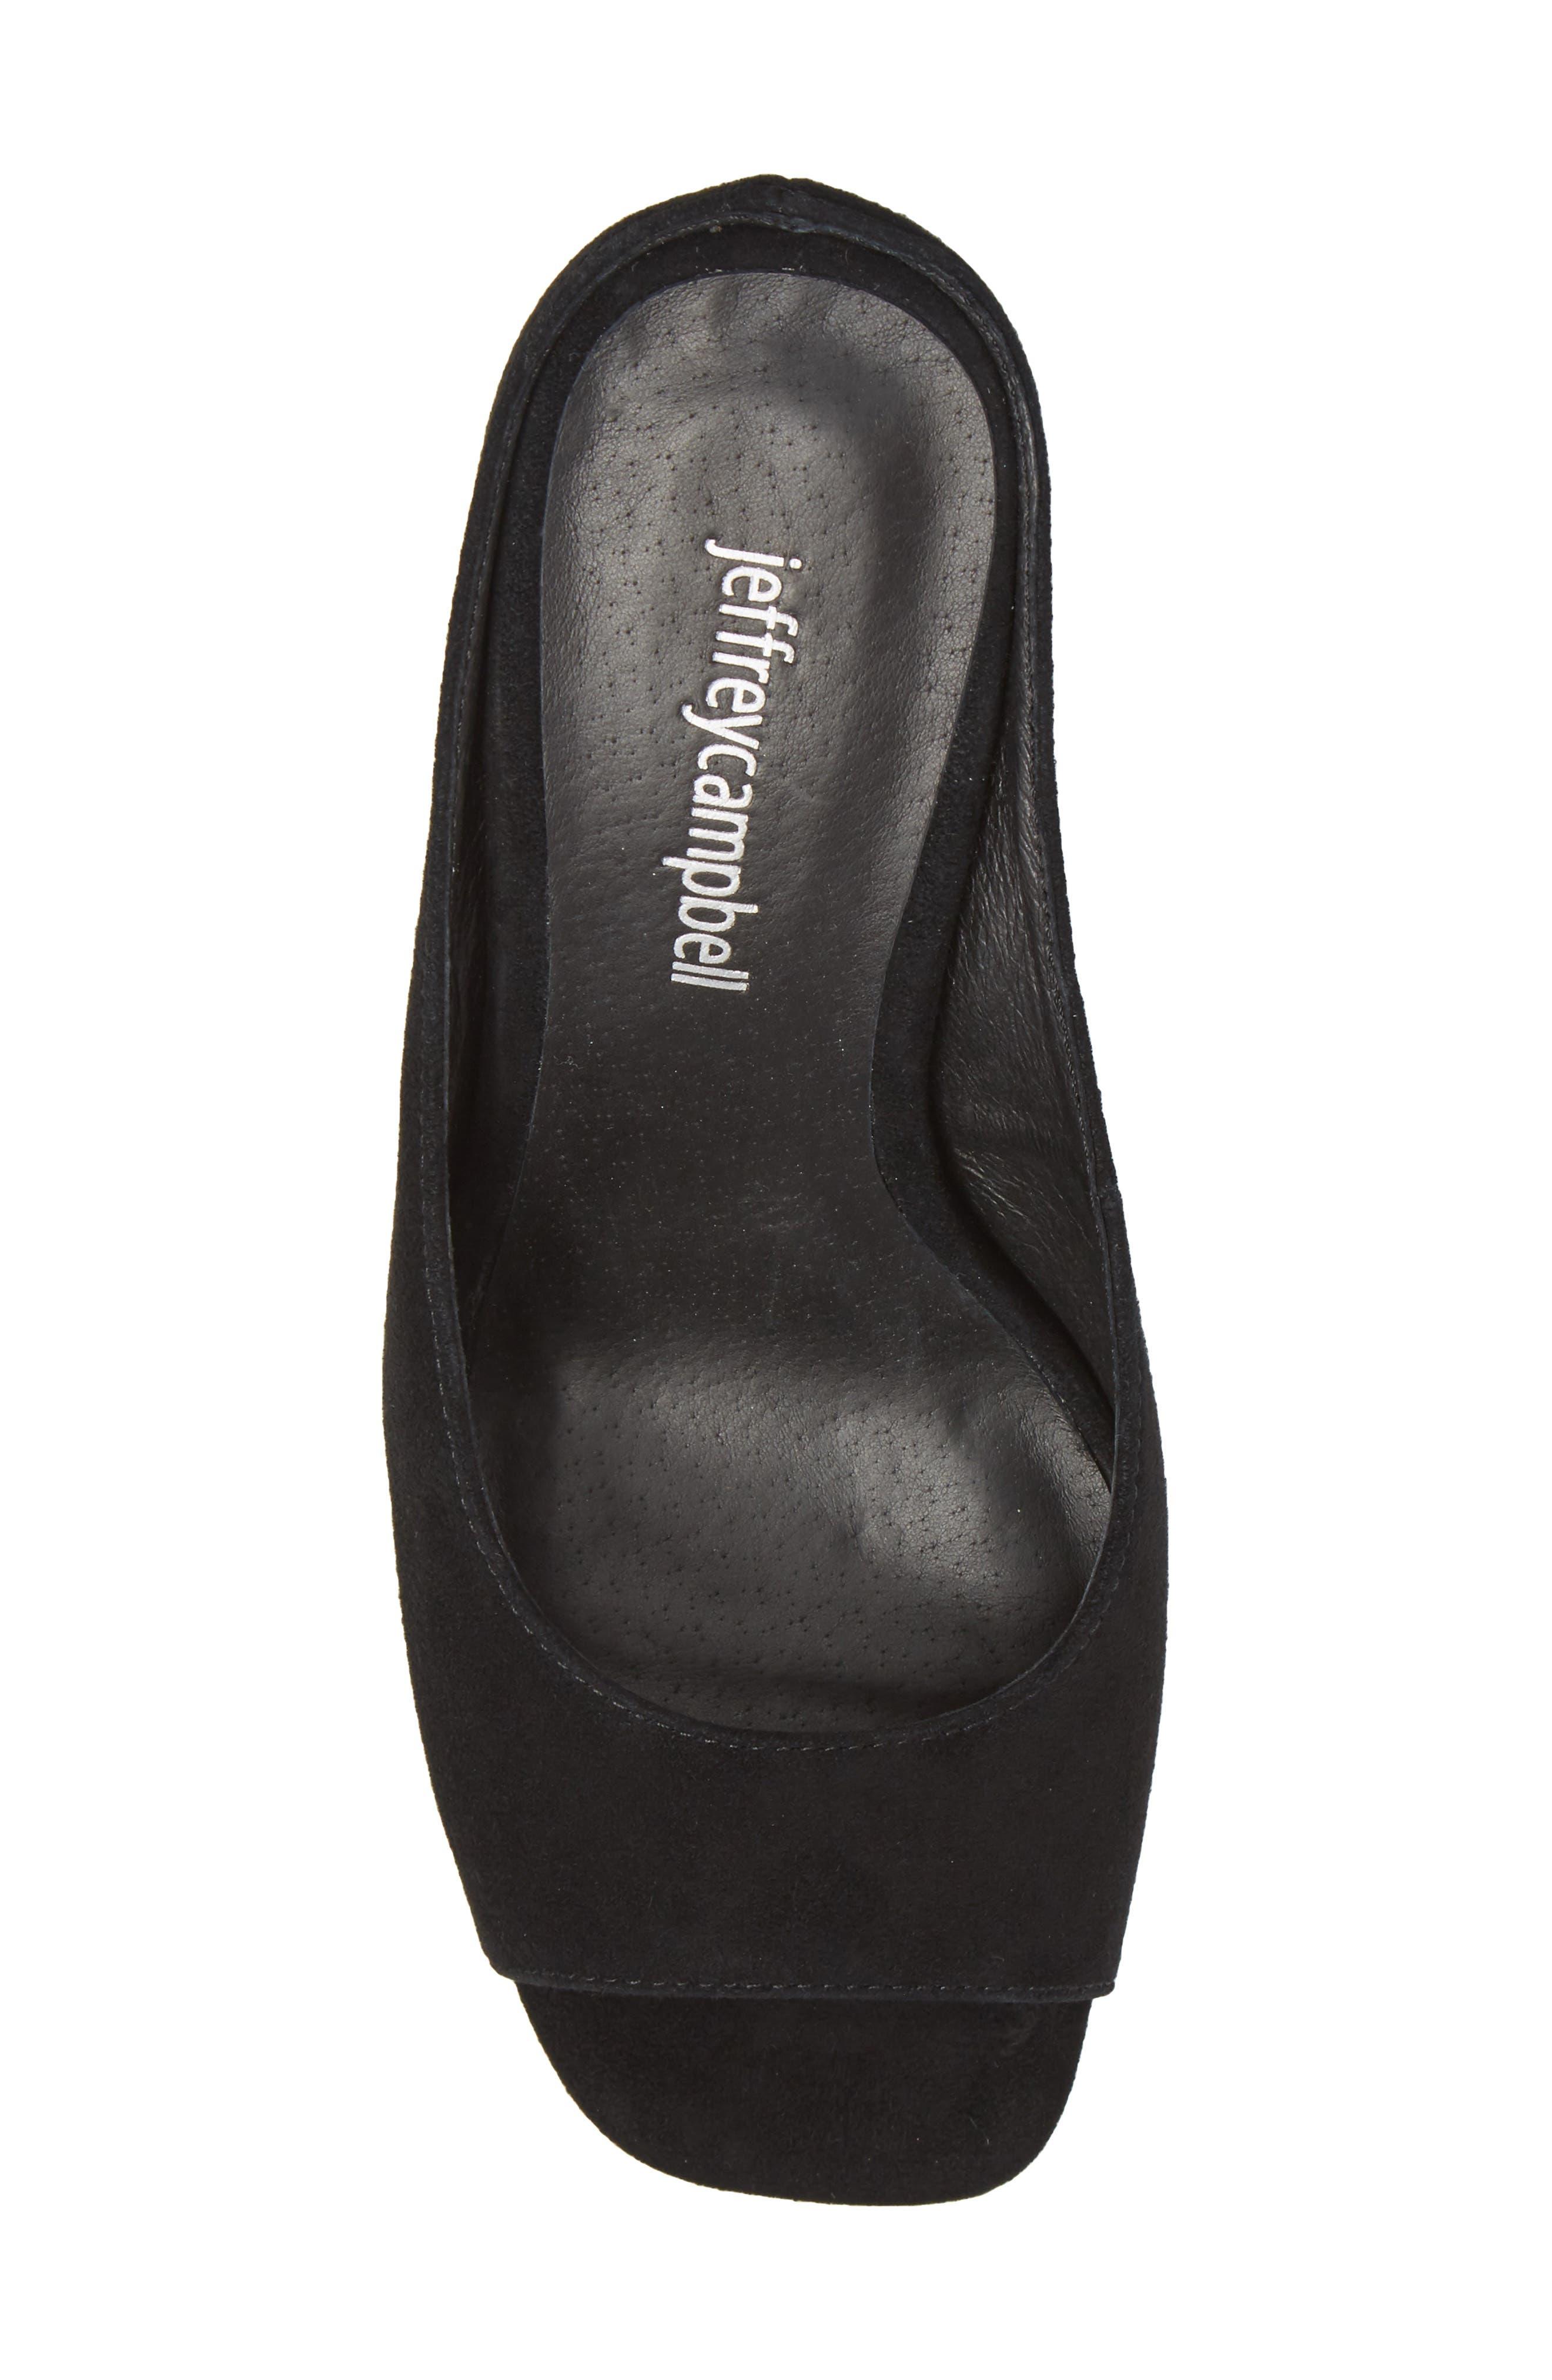 Generous Wedge Sandal,                             Alternate thumbnail 5, color,                             005